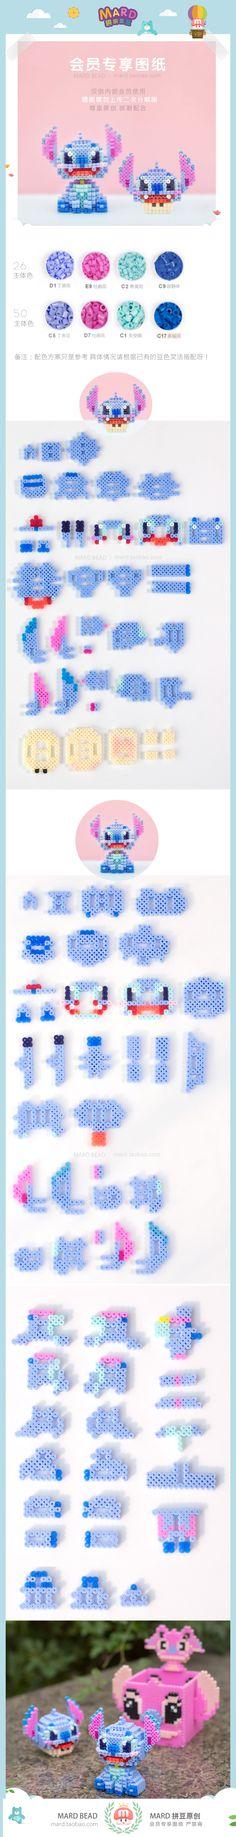 Hamma Beads 3d, Hamma Beads Ideas, Pearler Beads, Fuse Beads, Easy Perler Bead Patterns, Melty Bead Patterns, Perler Bead Templates, Perler Bead Disney, Diy Perler Beads